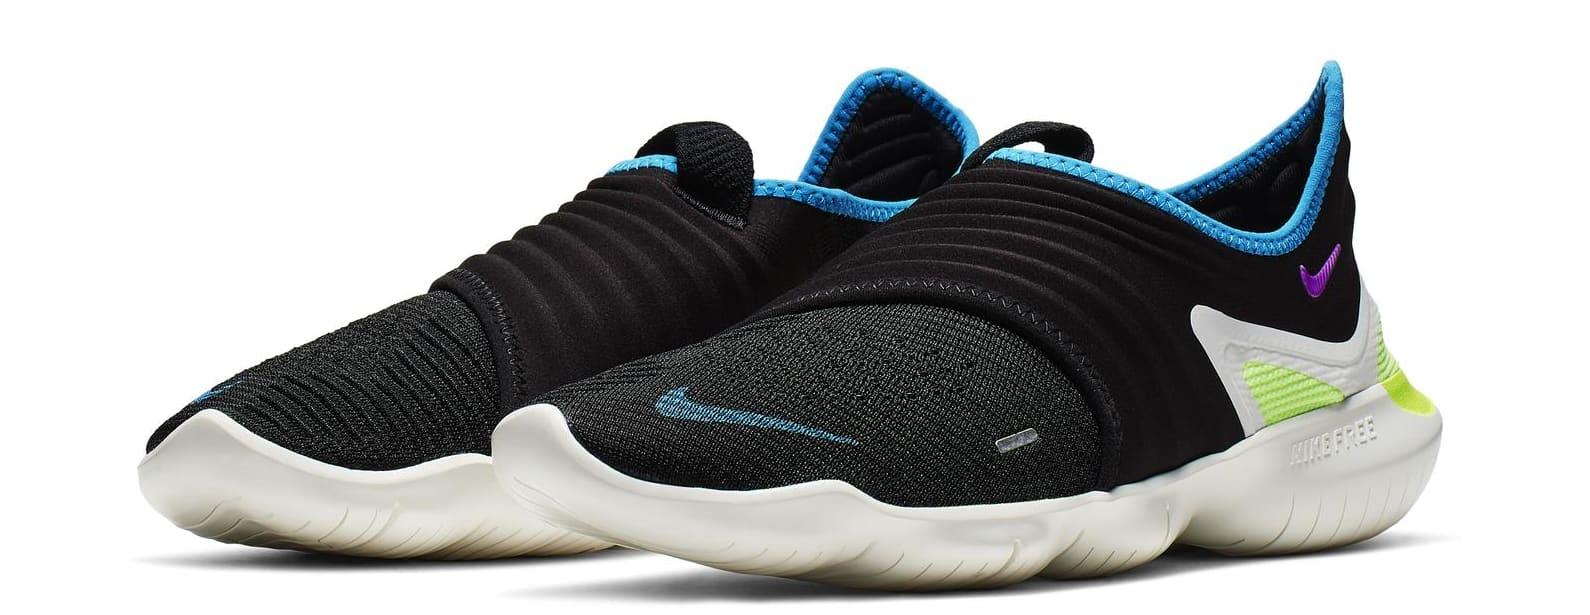 10c7c49bdcd44 Nike 2019 Free Running Collection Free RN Flyknit 3.0 Free RN 5.0 ...